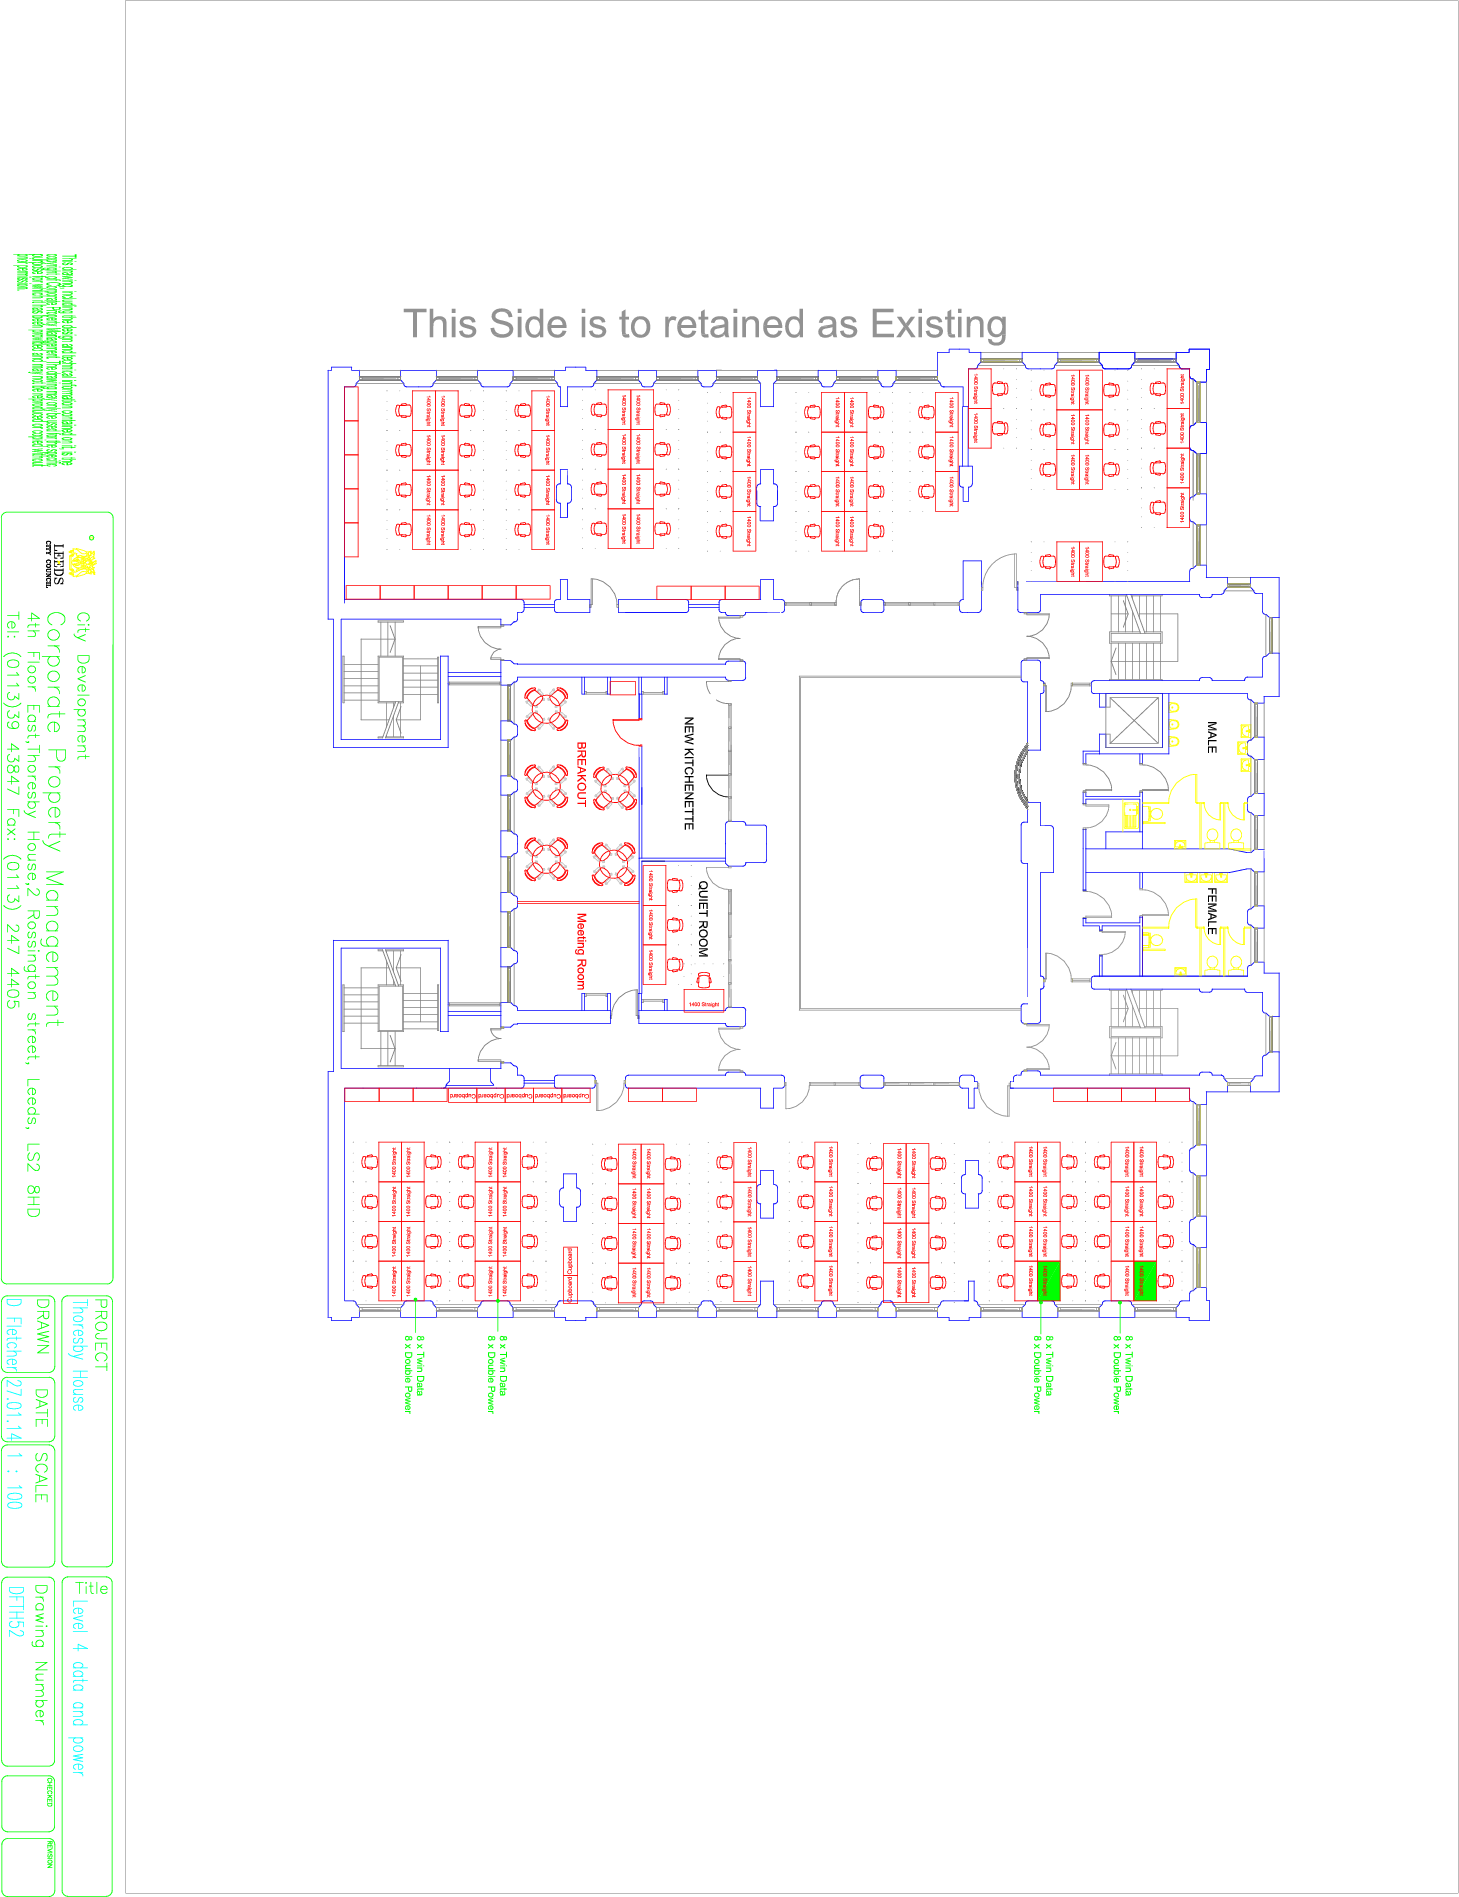 Thoresby Floor Plans